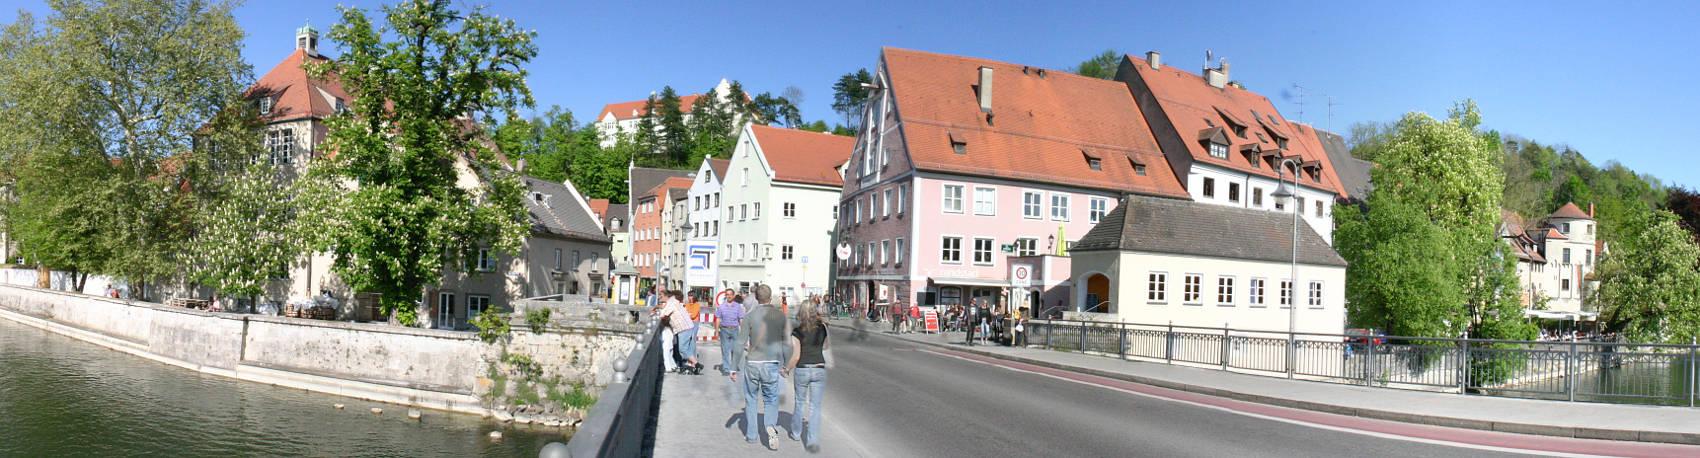 Hotels Pensionen Landsberg Am Lech